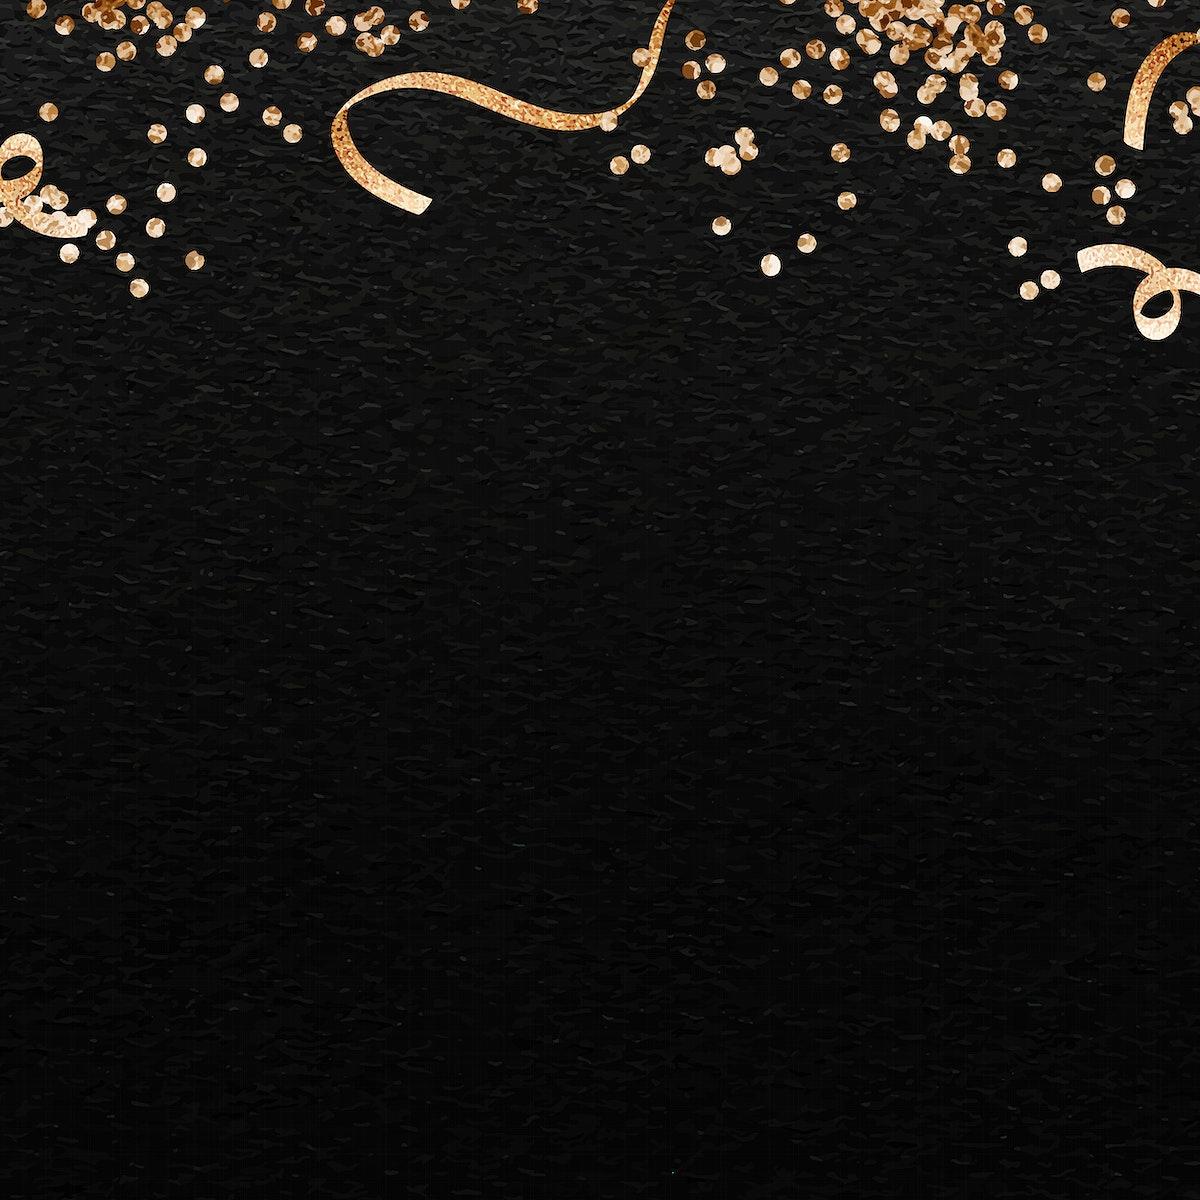 Black festive  background template vector